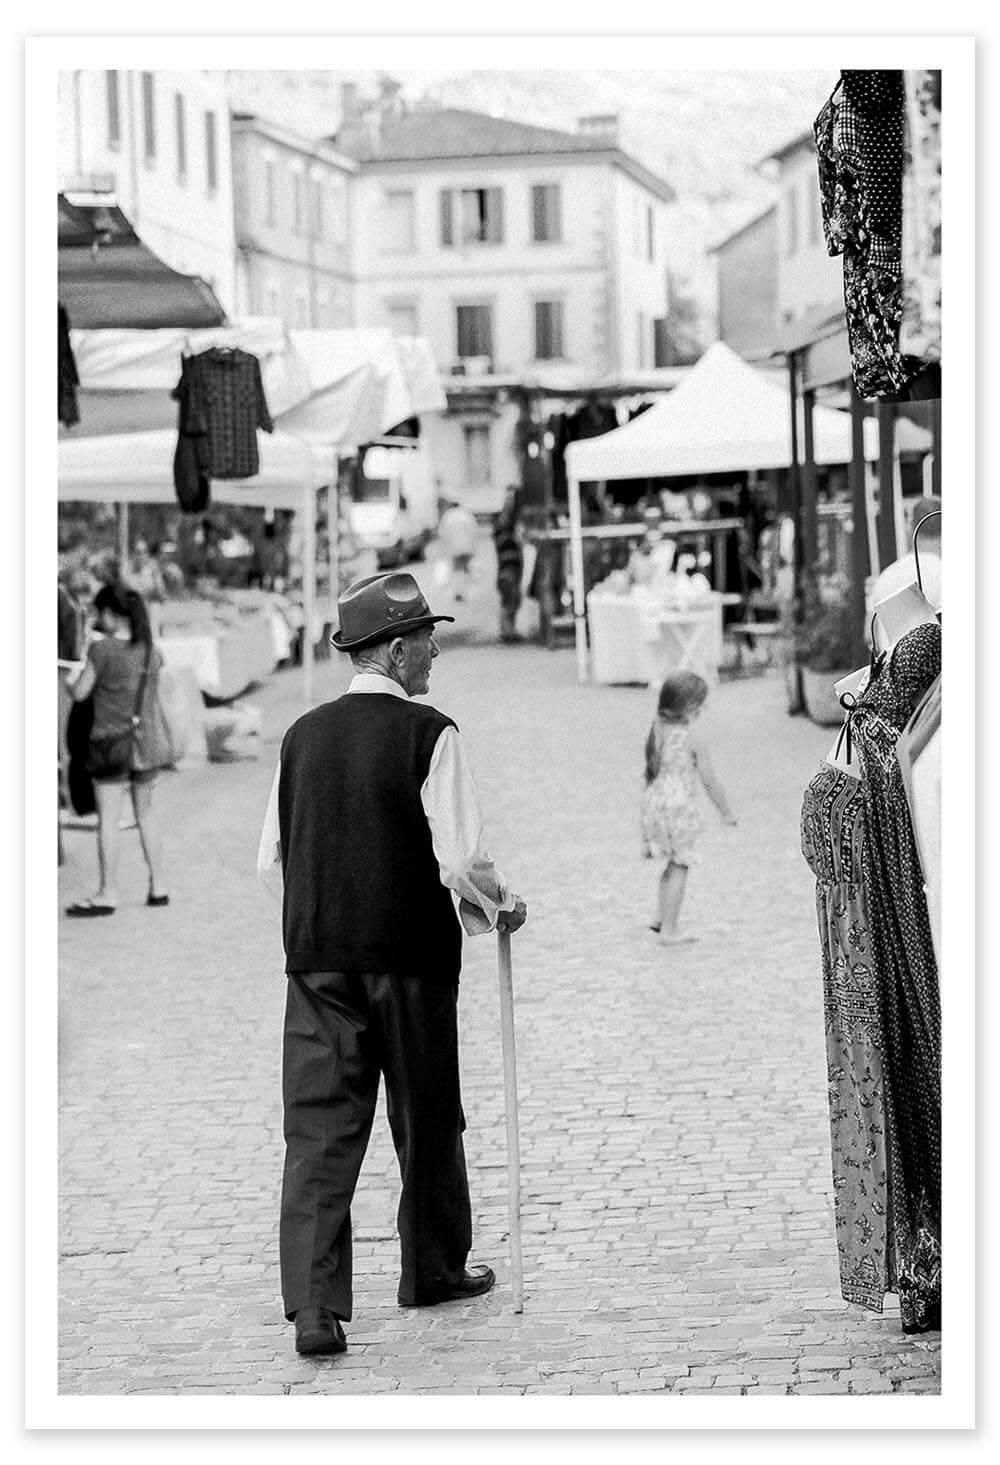 An old man strolls through  centro  in Castel Del Rio, Italy.  Exif Data: 1/160 sec ; f/4.5 ; ISO 200